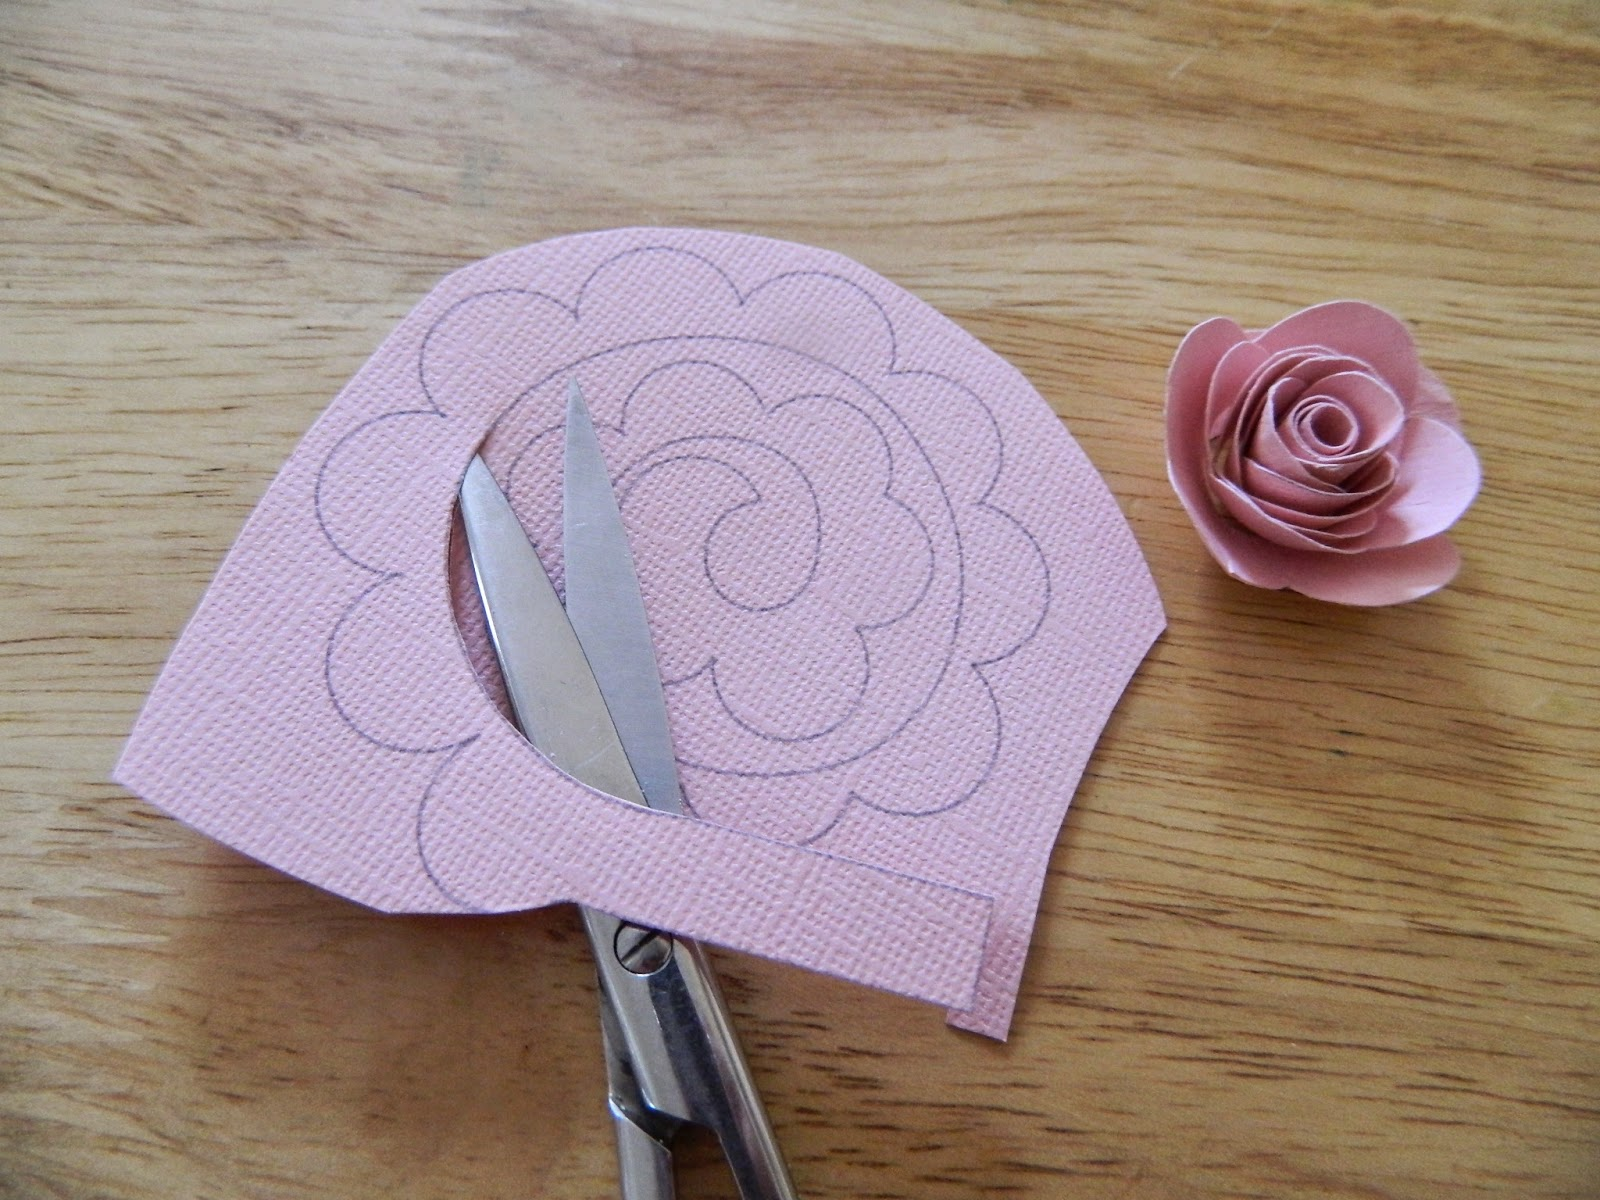 Цветы из бумаги пошаговое фото шаблоны